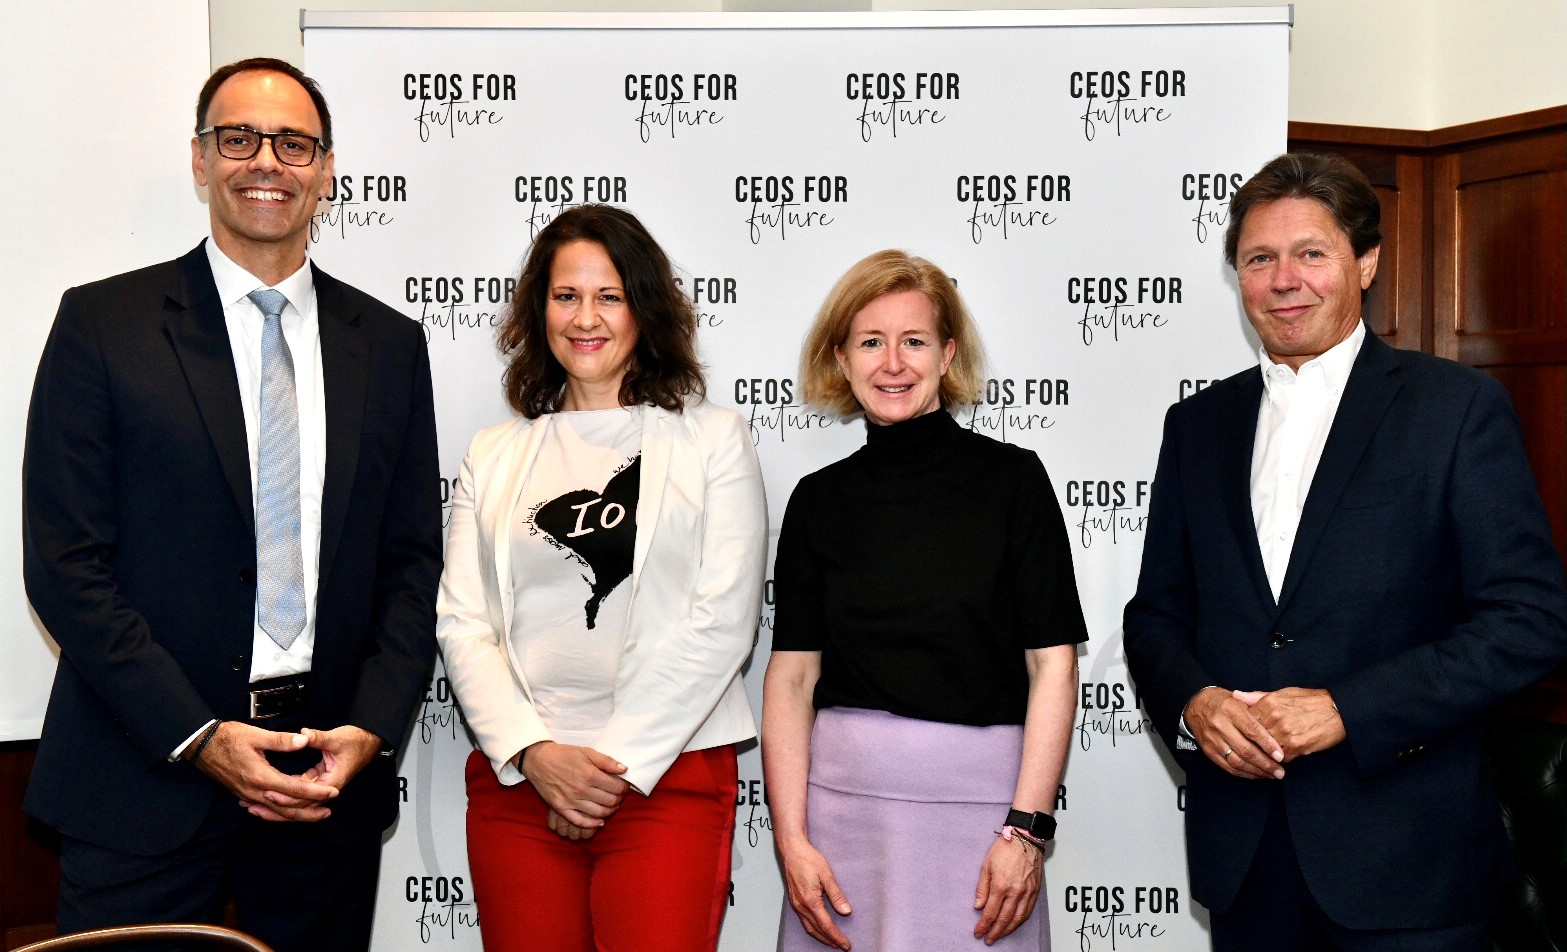 C4F Pressegespräch, 28.09.2021, Wien - CO2-Paper: Berthold Kren (Berthold Kren, CEO LAFARGE Zementwerke GmbH), Christiane Brunner (Vorständin CEOs FOR FUTURE), Birgit Kraft-Kinz (Vorständin CEOs FOR FUTURE), Wolfgang Anzengruber (Vorstand CEOs FOR FUTURE). Fotocredit: Paris Tsitsos